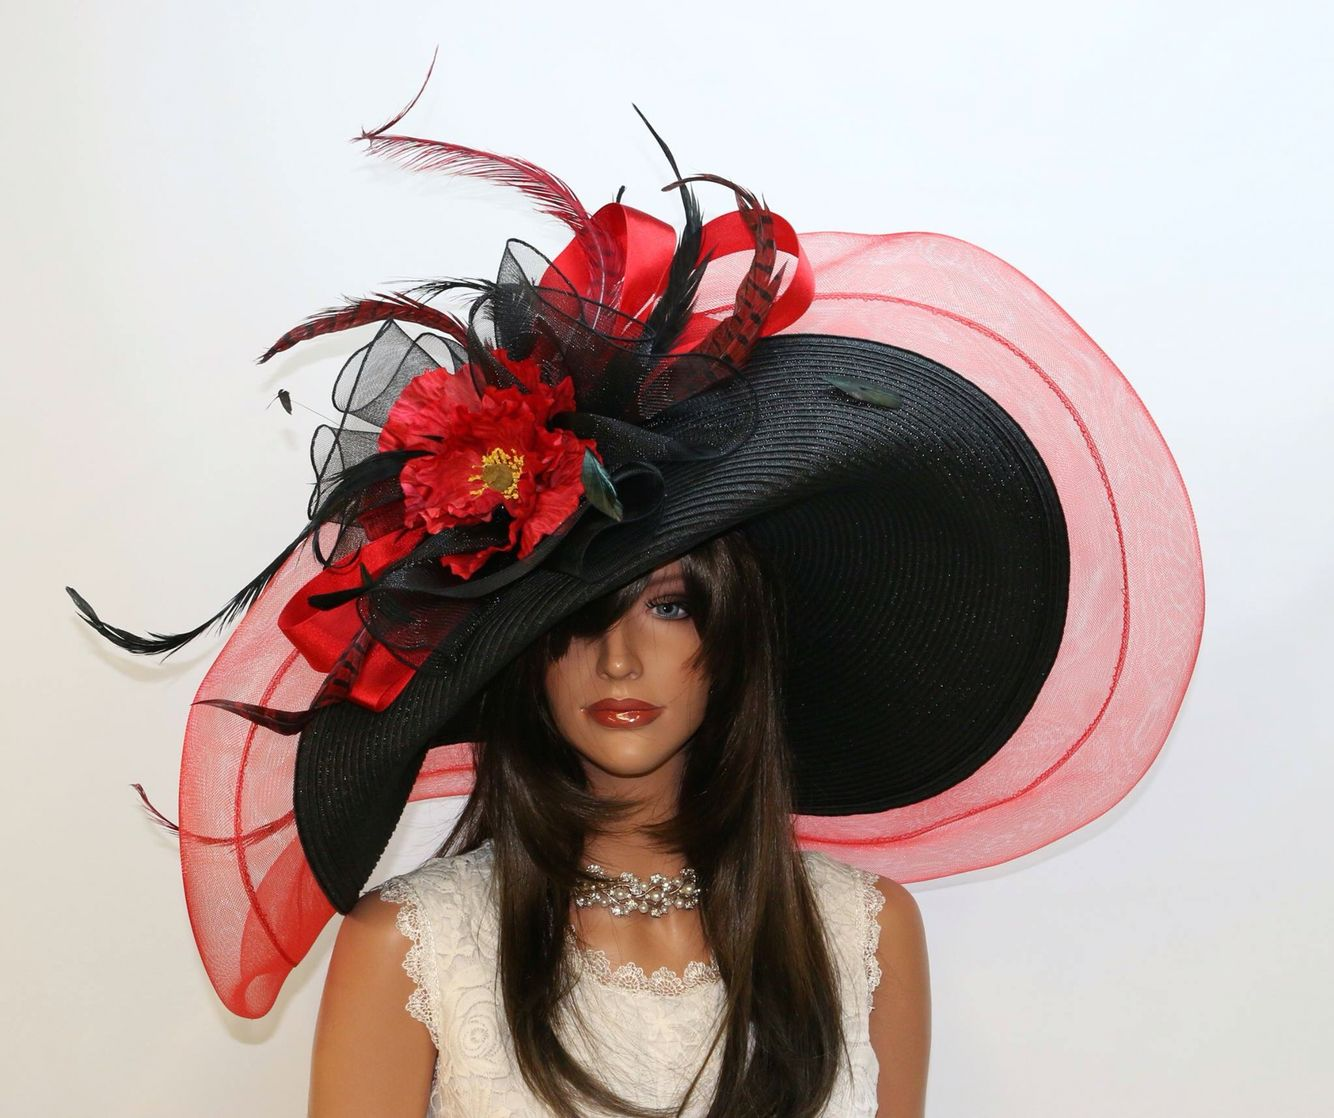 dc20aa0eb13e4 Kentucky derby hats by Vinzetta